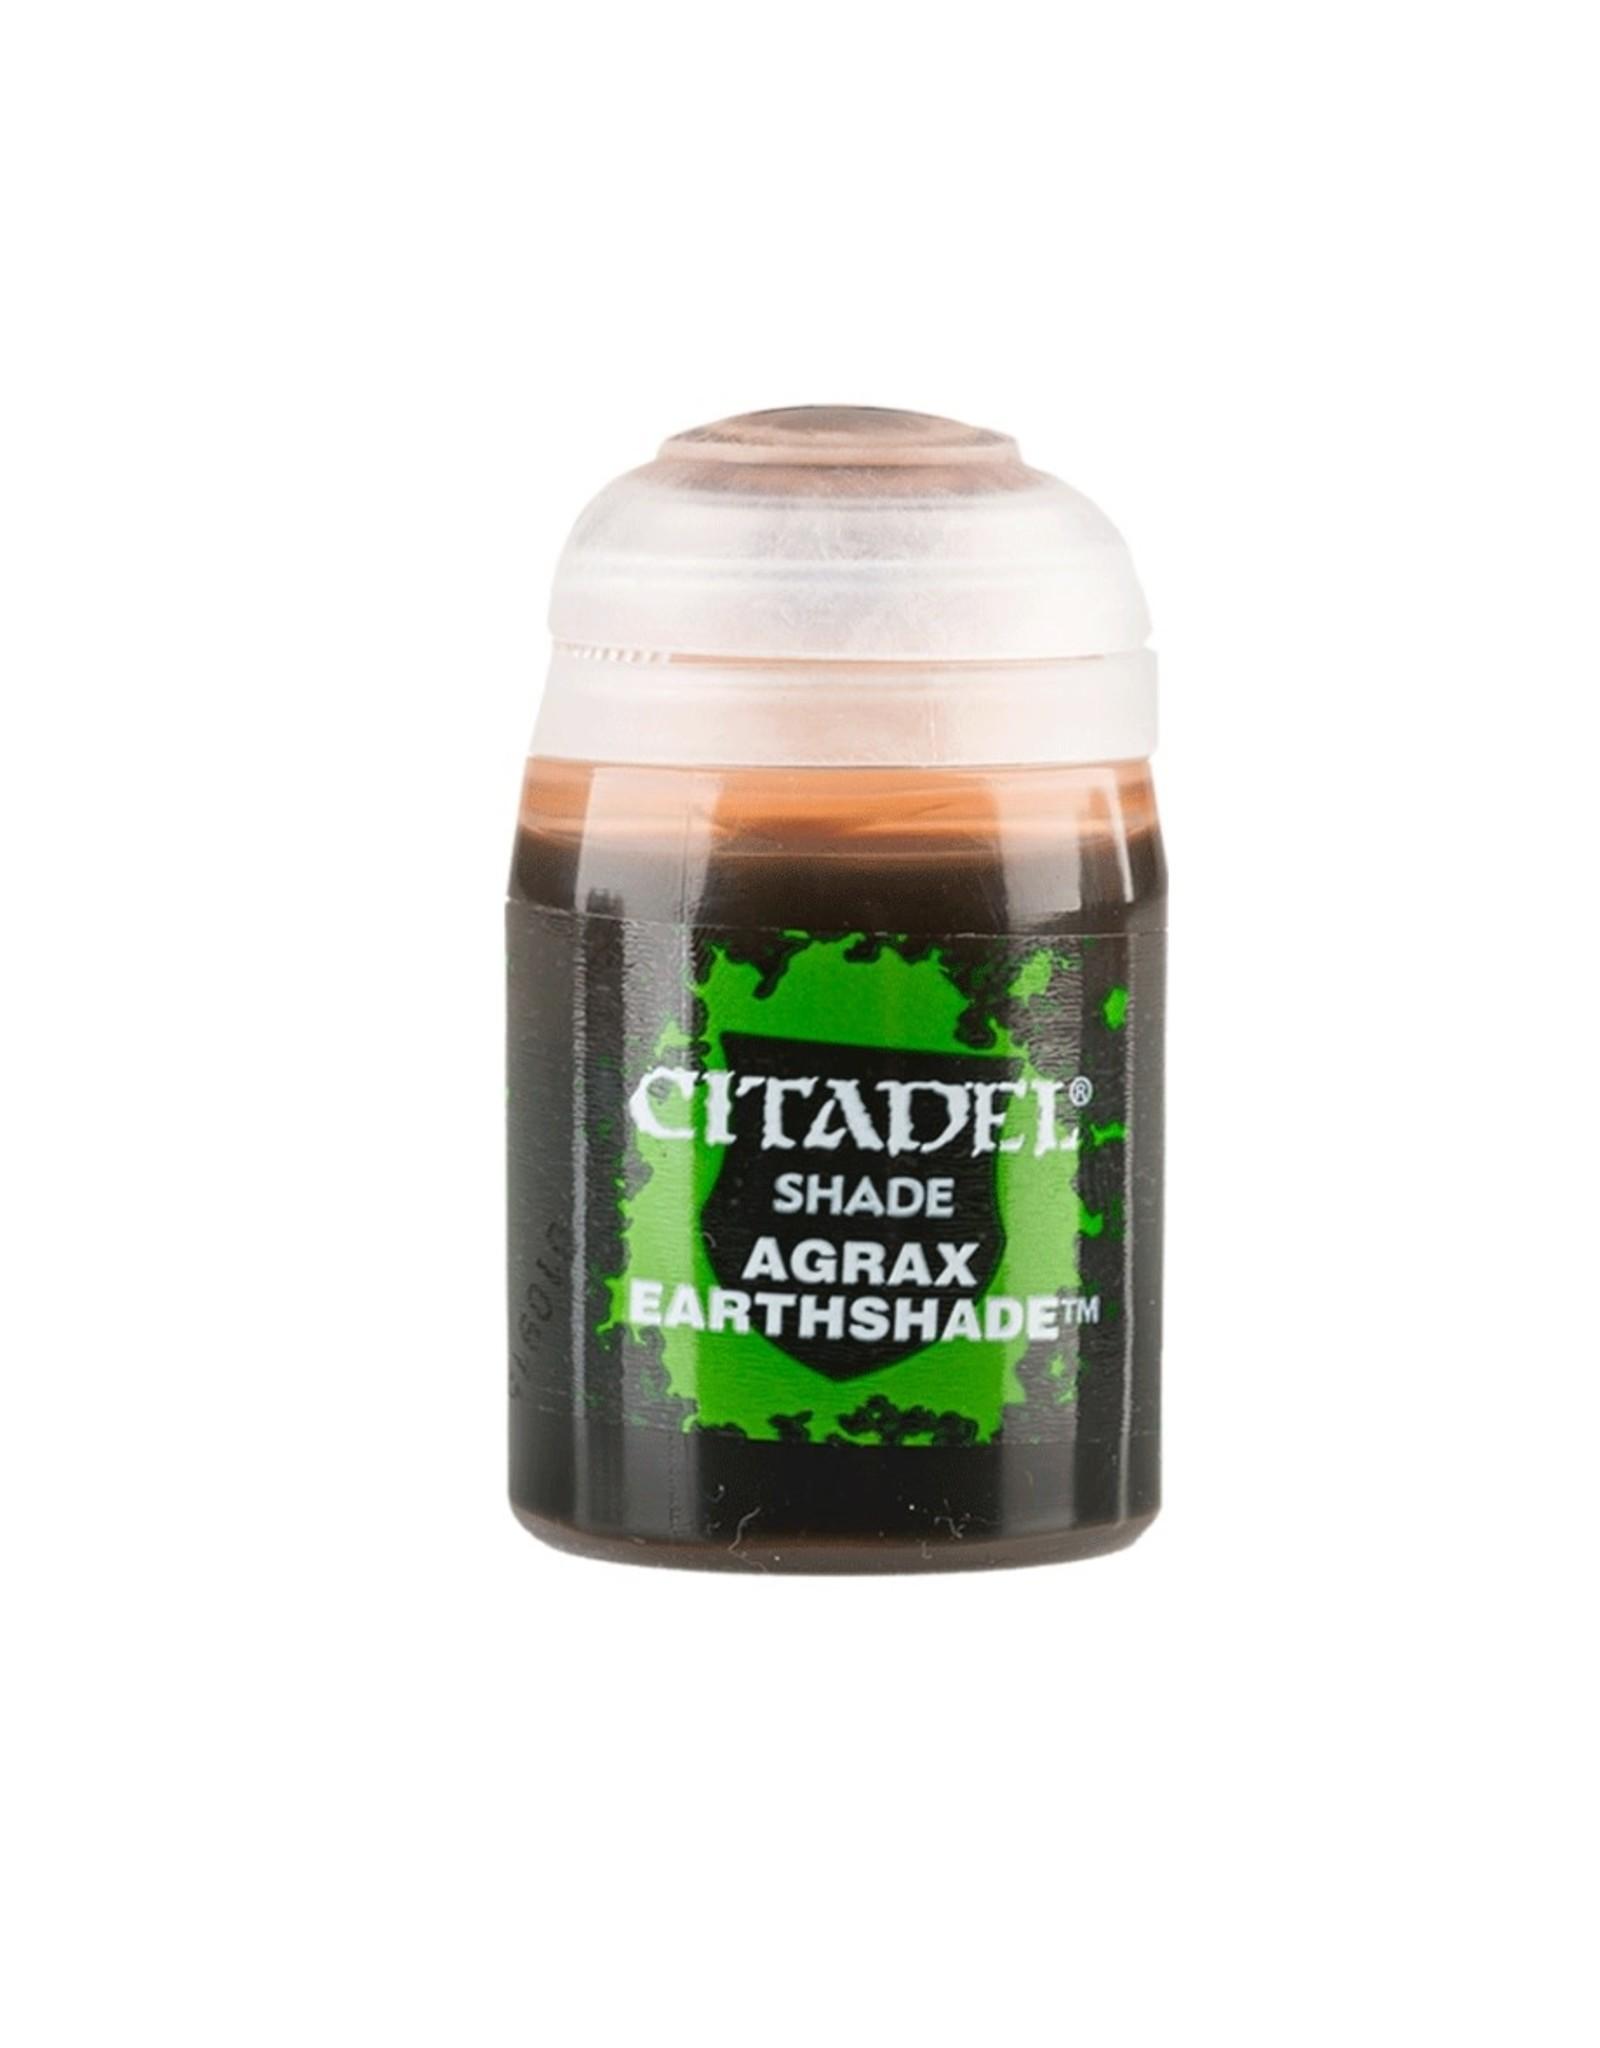 Games Workshop Citadel Shade Agrax Earthshade (24ML)